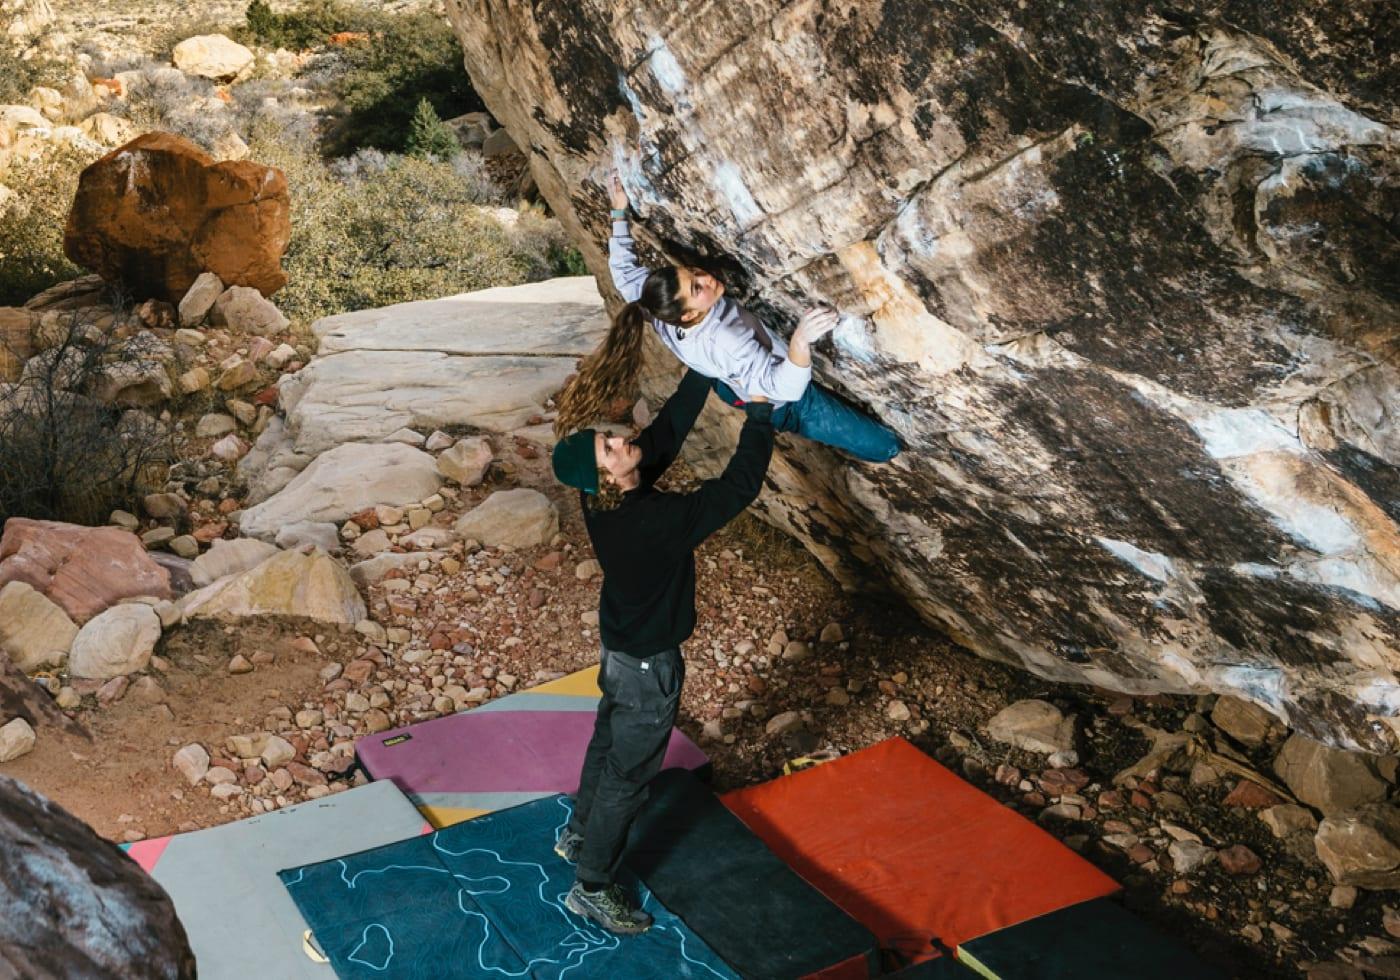 Janja Garnbret climbing indoors wearing 5.10 climbing shoes